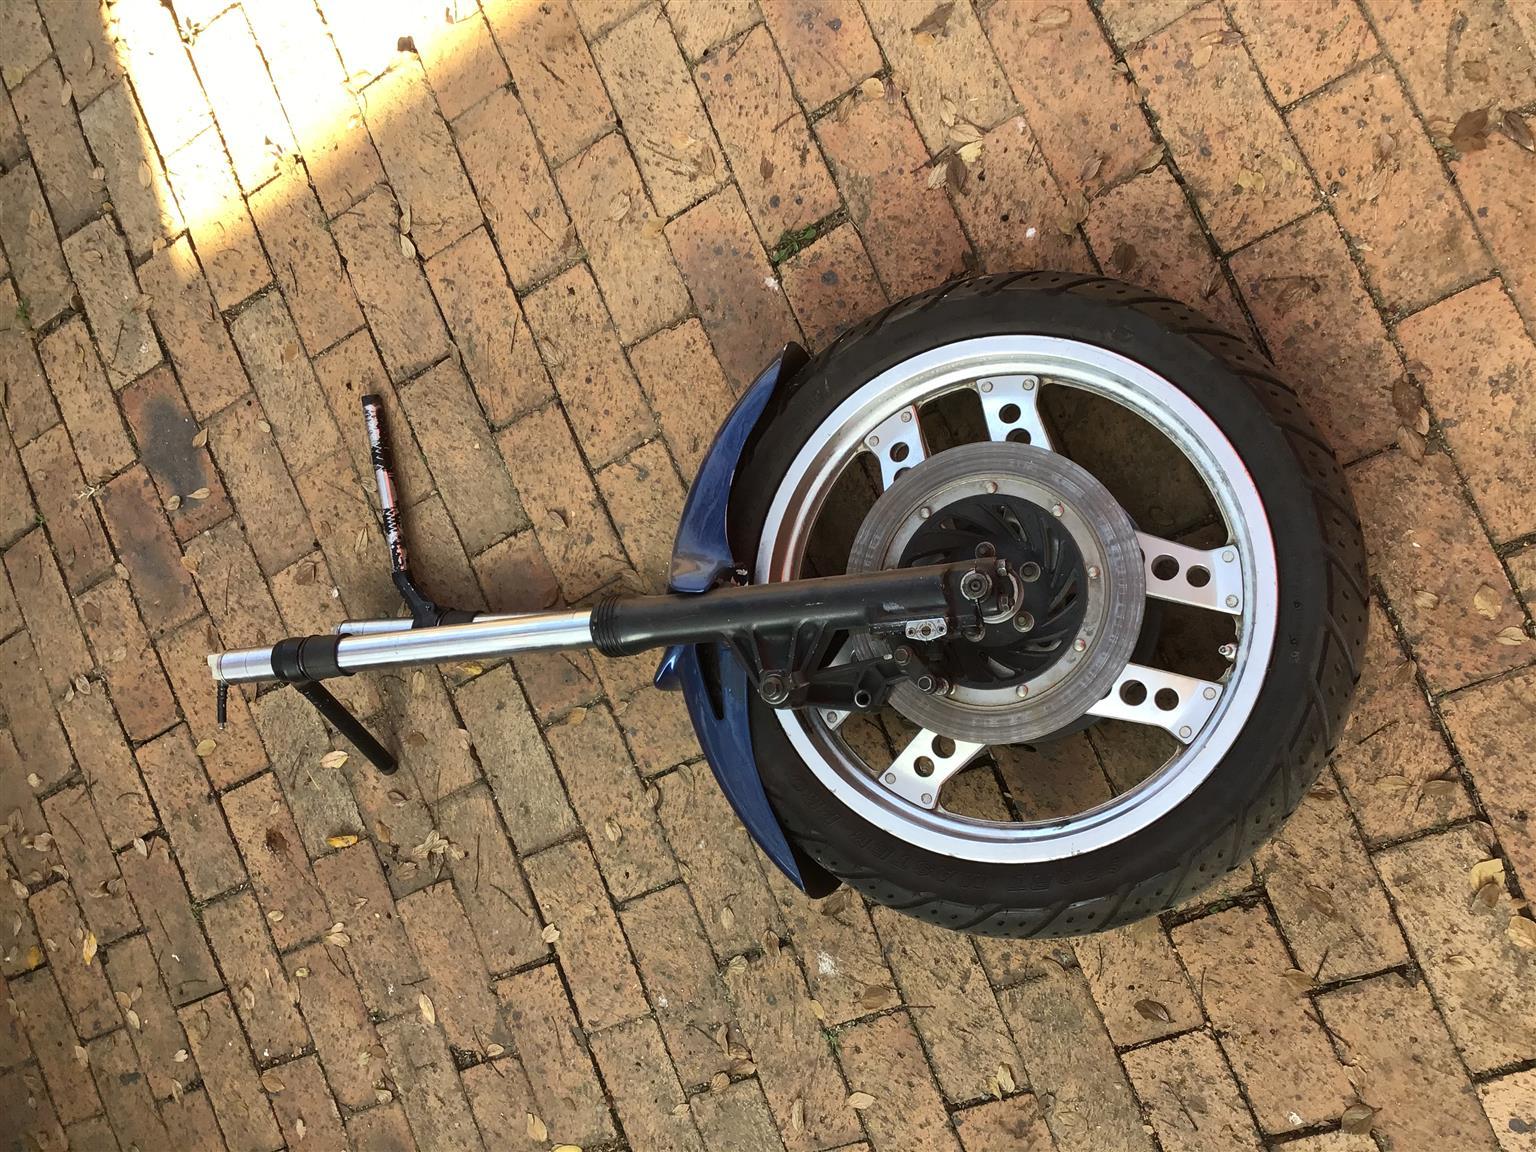 Honda cb900 parts for sale